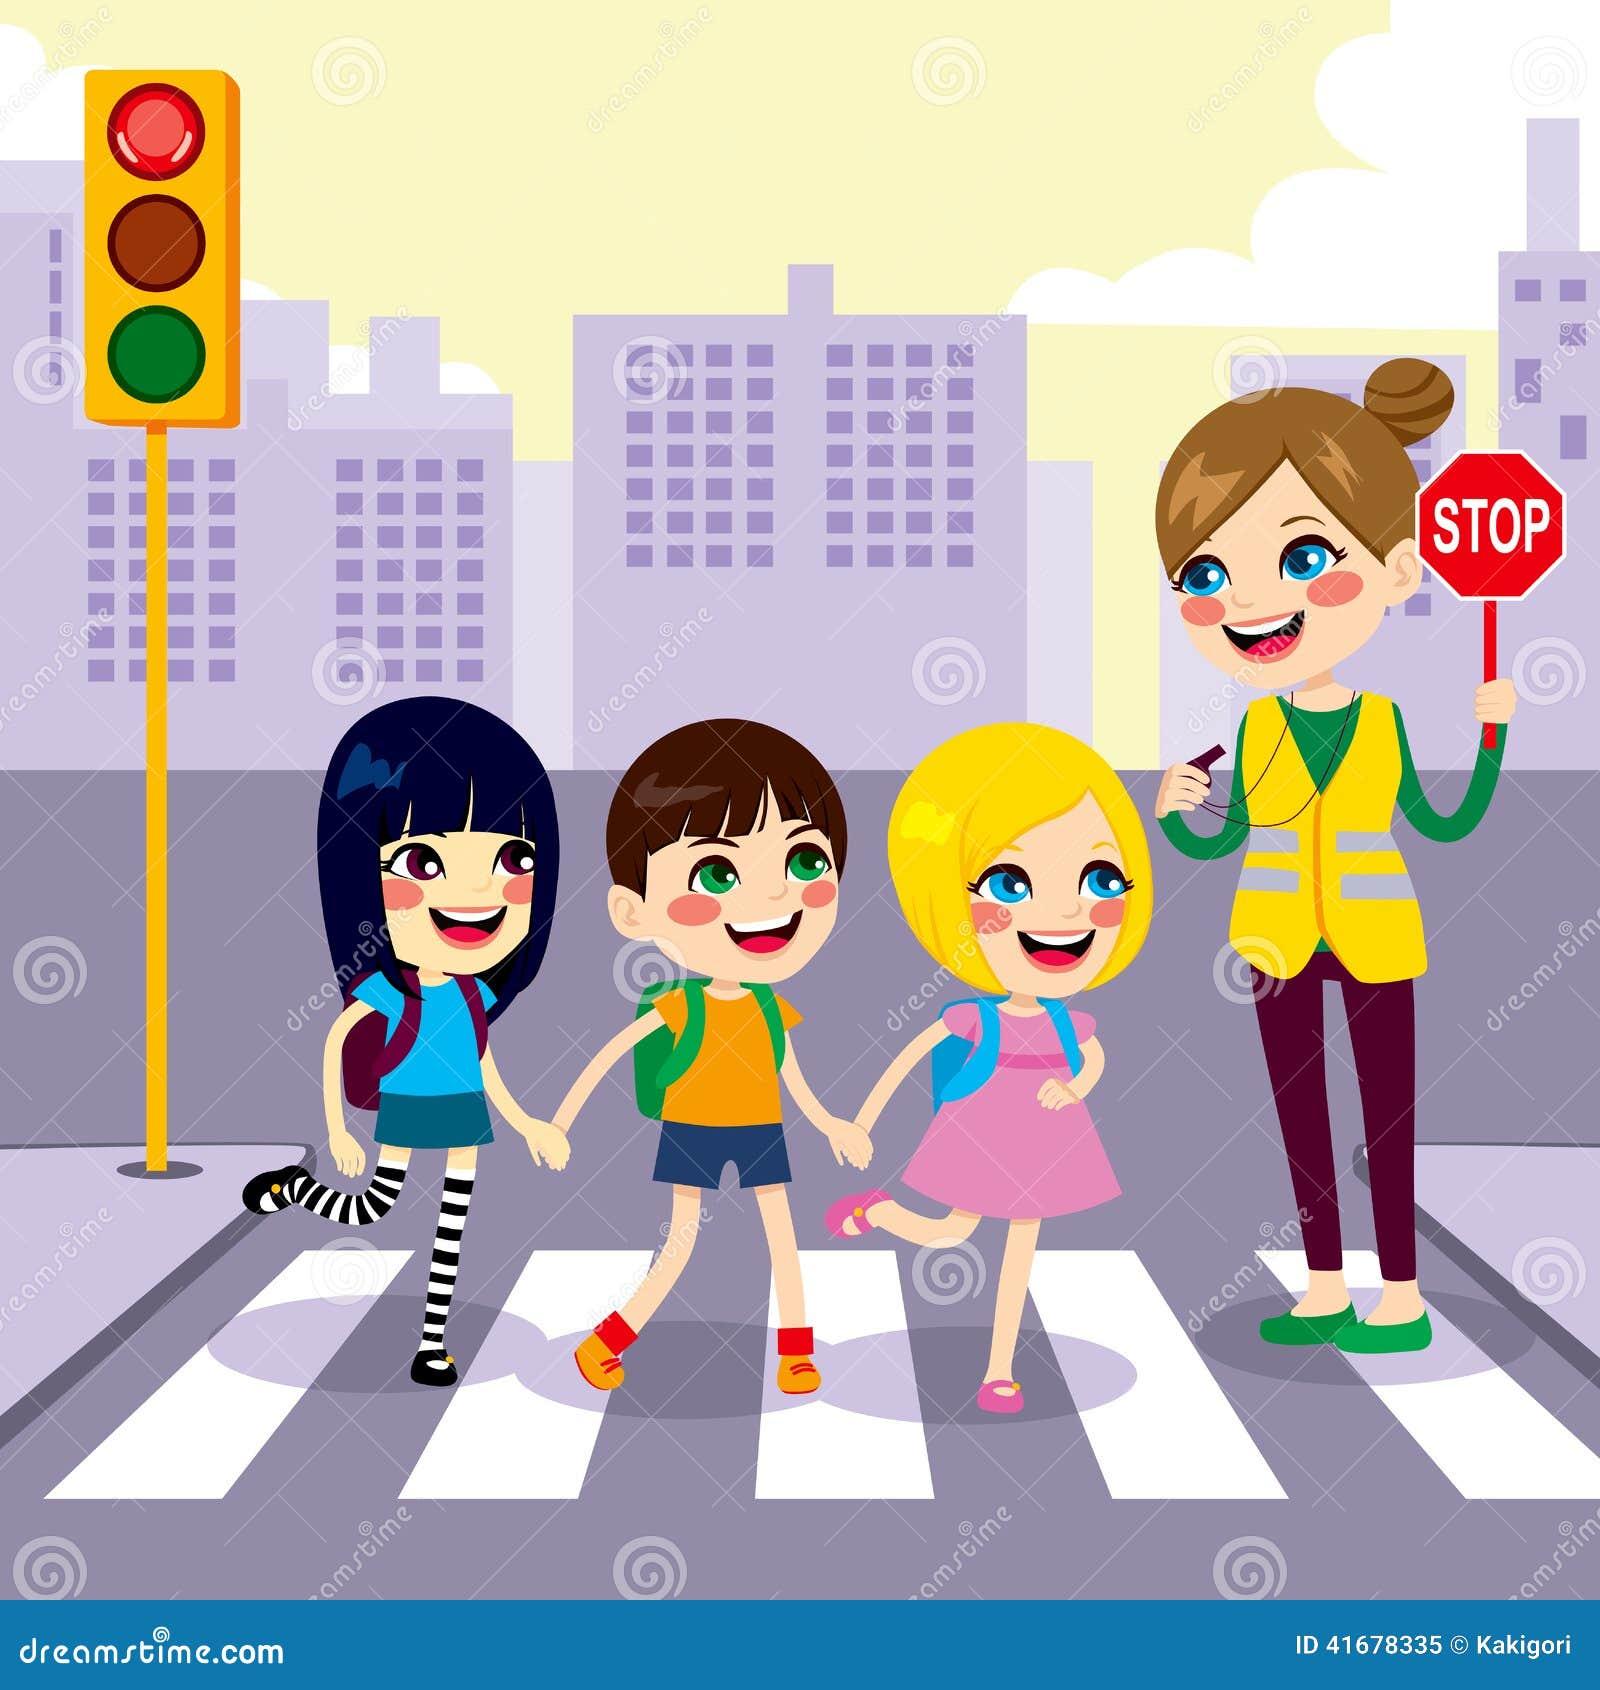 School Students Crossing Street Stock Vector Illustration Of City